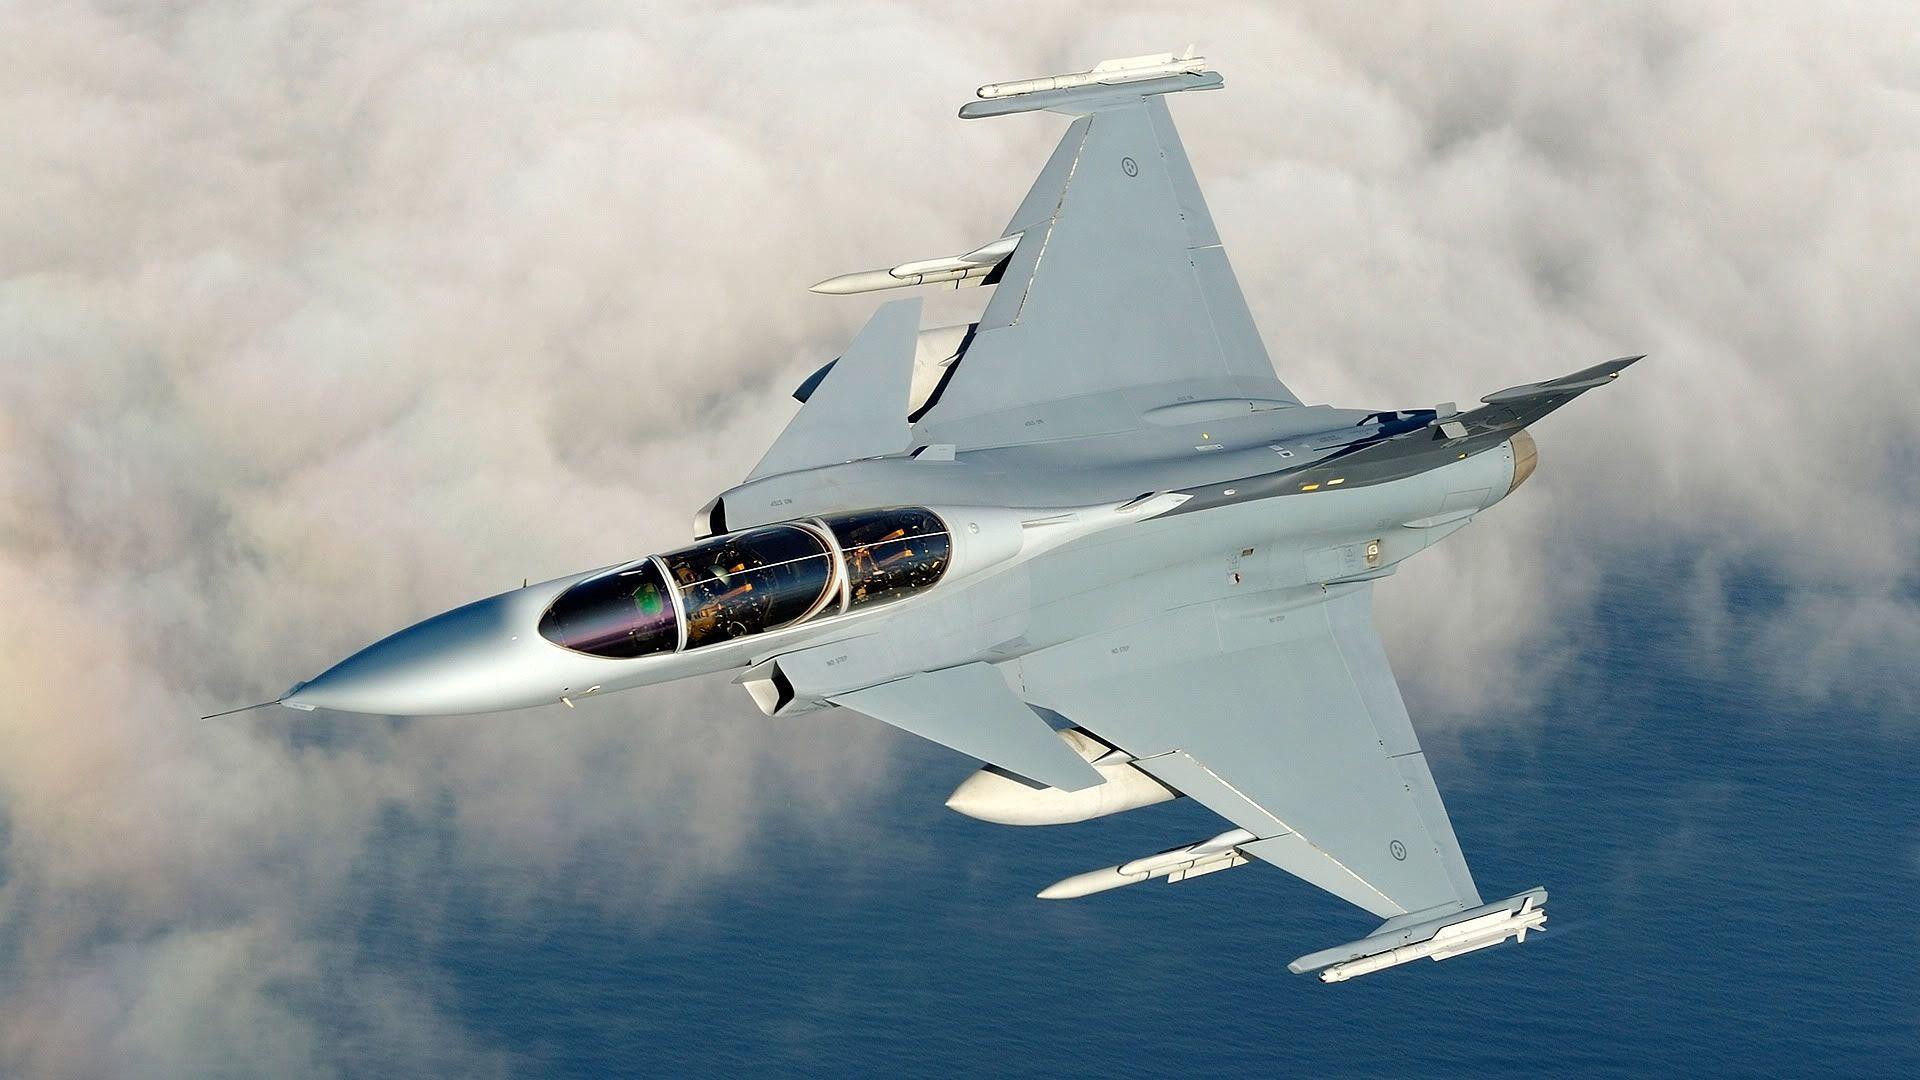 aircraft image | aircraft wallpapers - hd wallpapers - widescreen